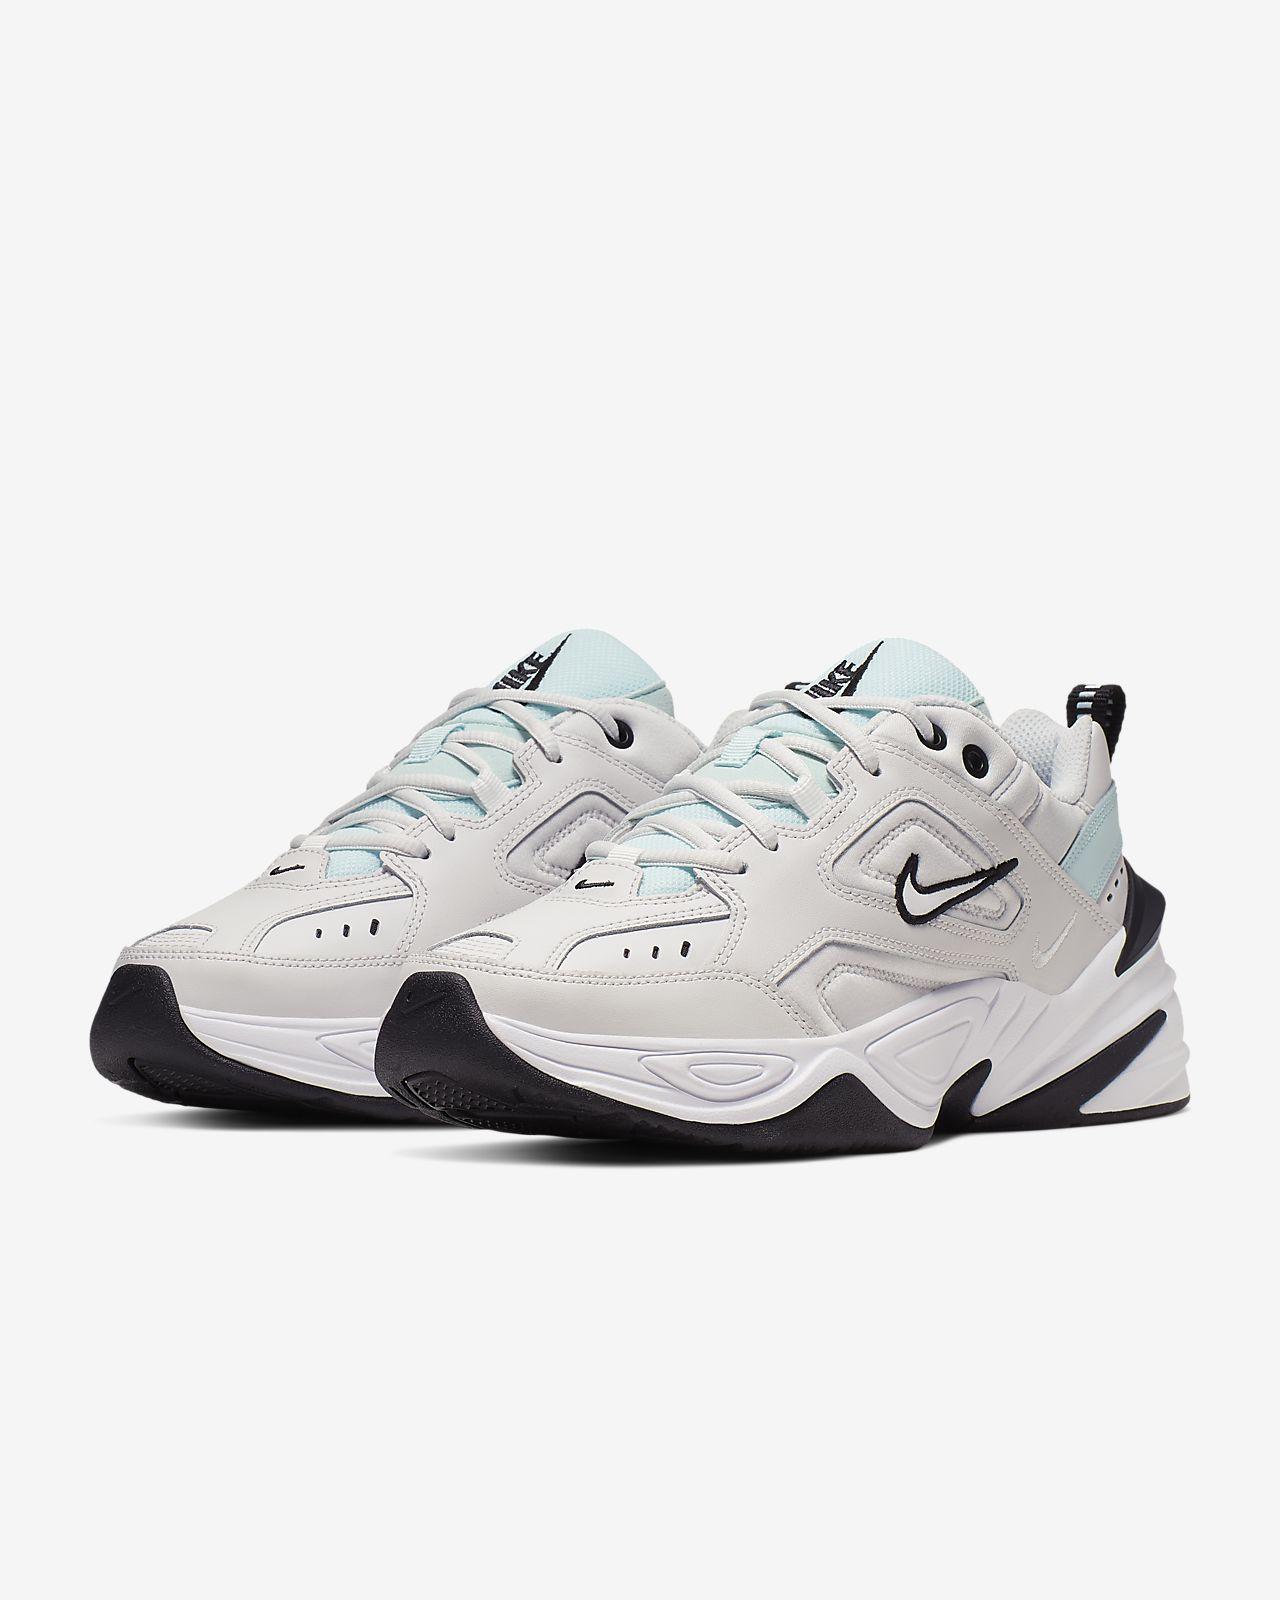 lower price with e0db5 b76c3 Low Resolution Nike M2K Tekno Shoe Nike M2K Tekno Shoe